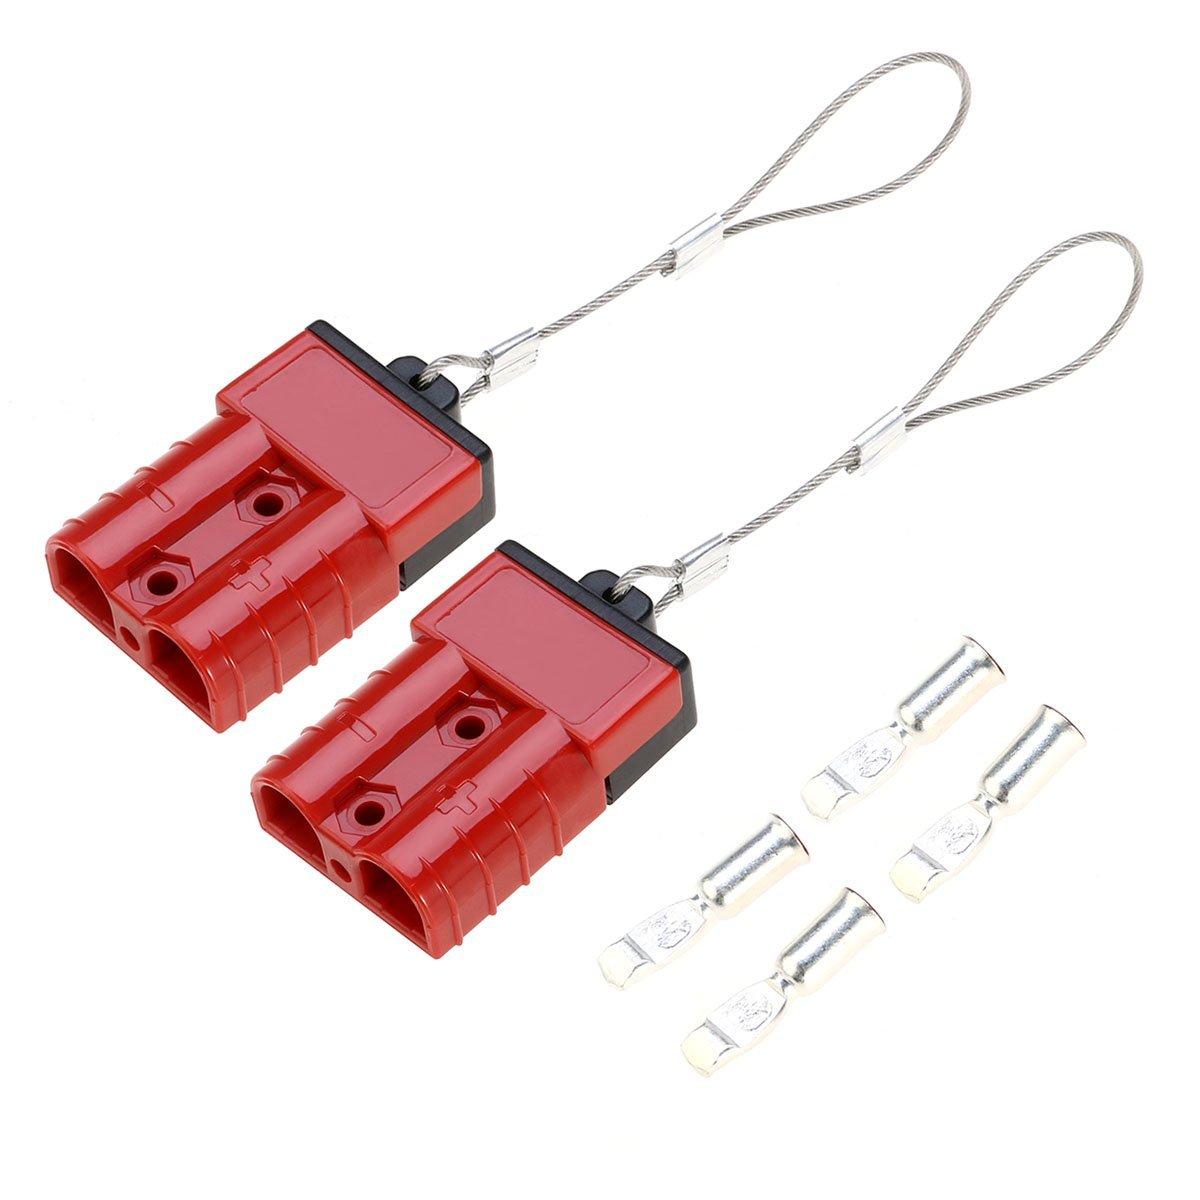 HTB1V5I_lER1BeNjy0Fmq6z0wVXaf cheap battery disconnect plug, find battery disconnect plug deals on